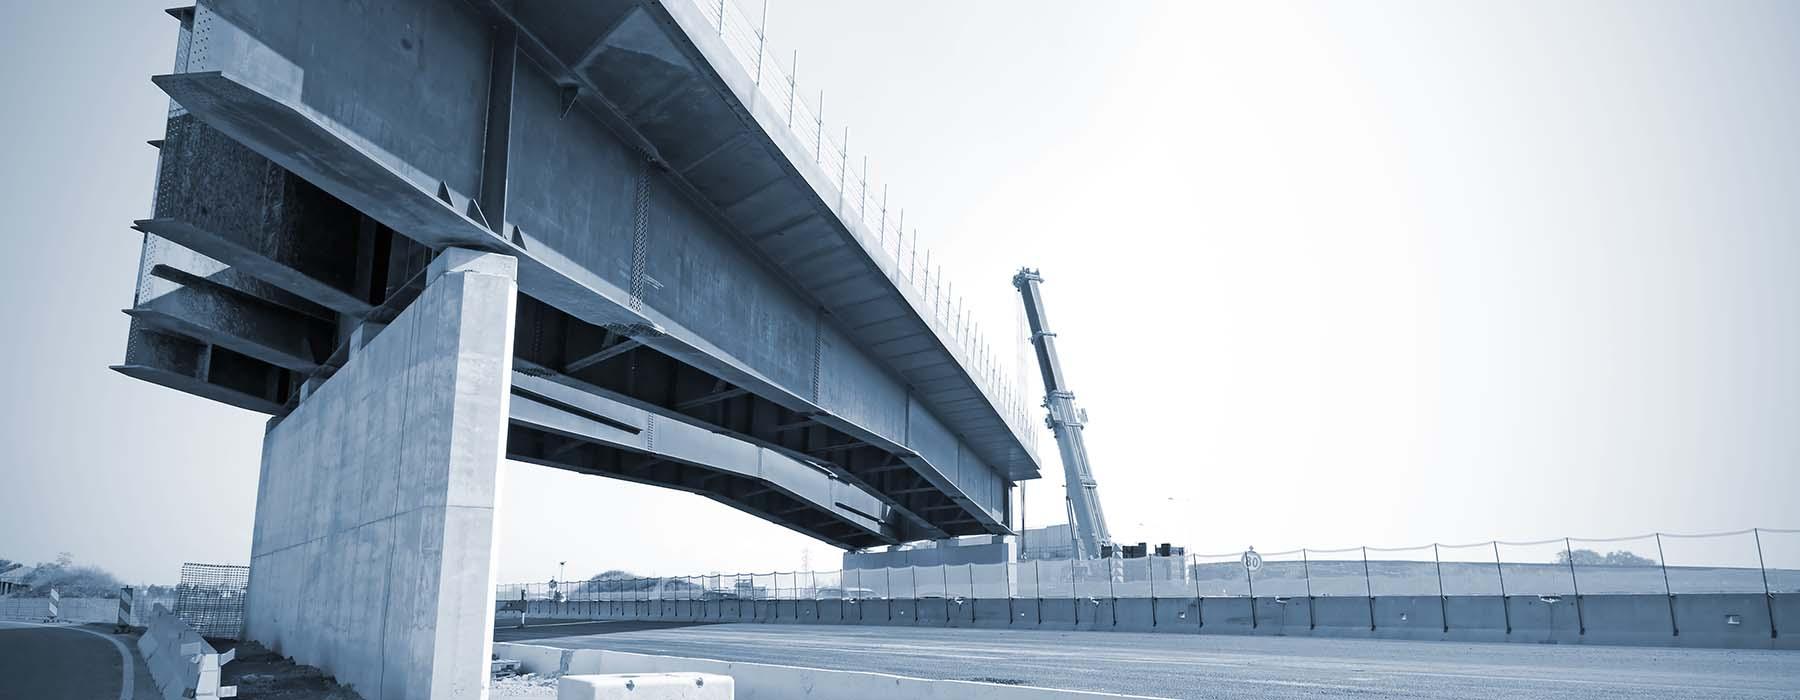 bridge on highway